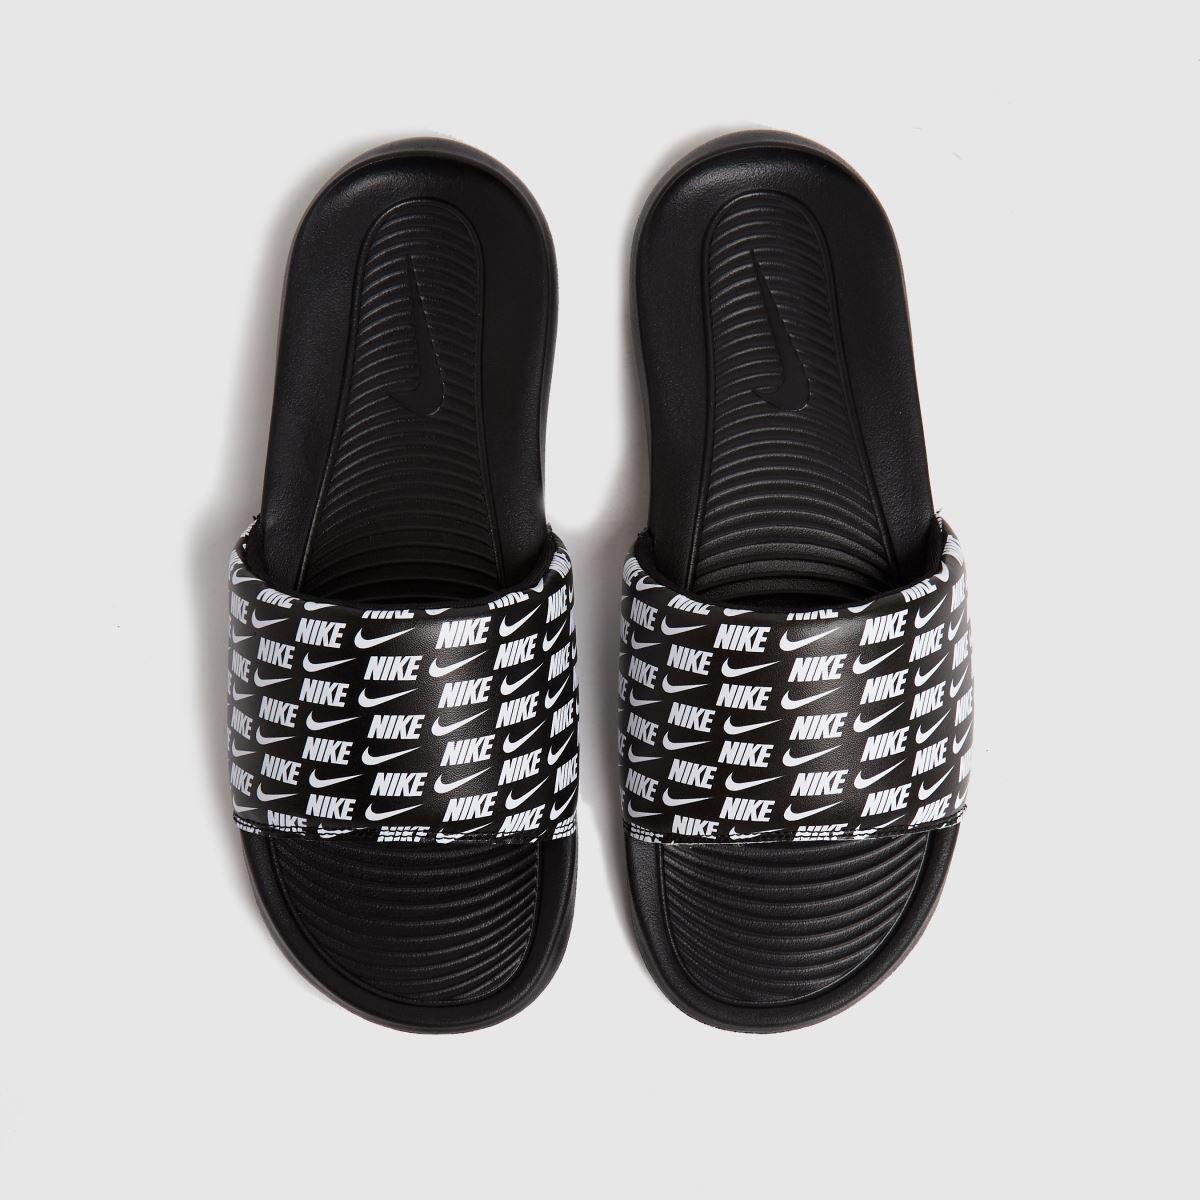 Nike Black & White Victori One Sandals